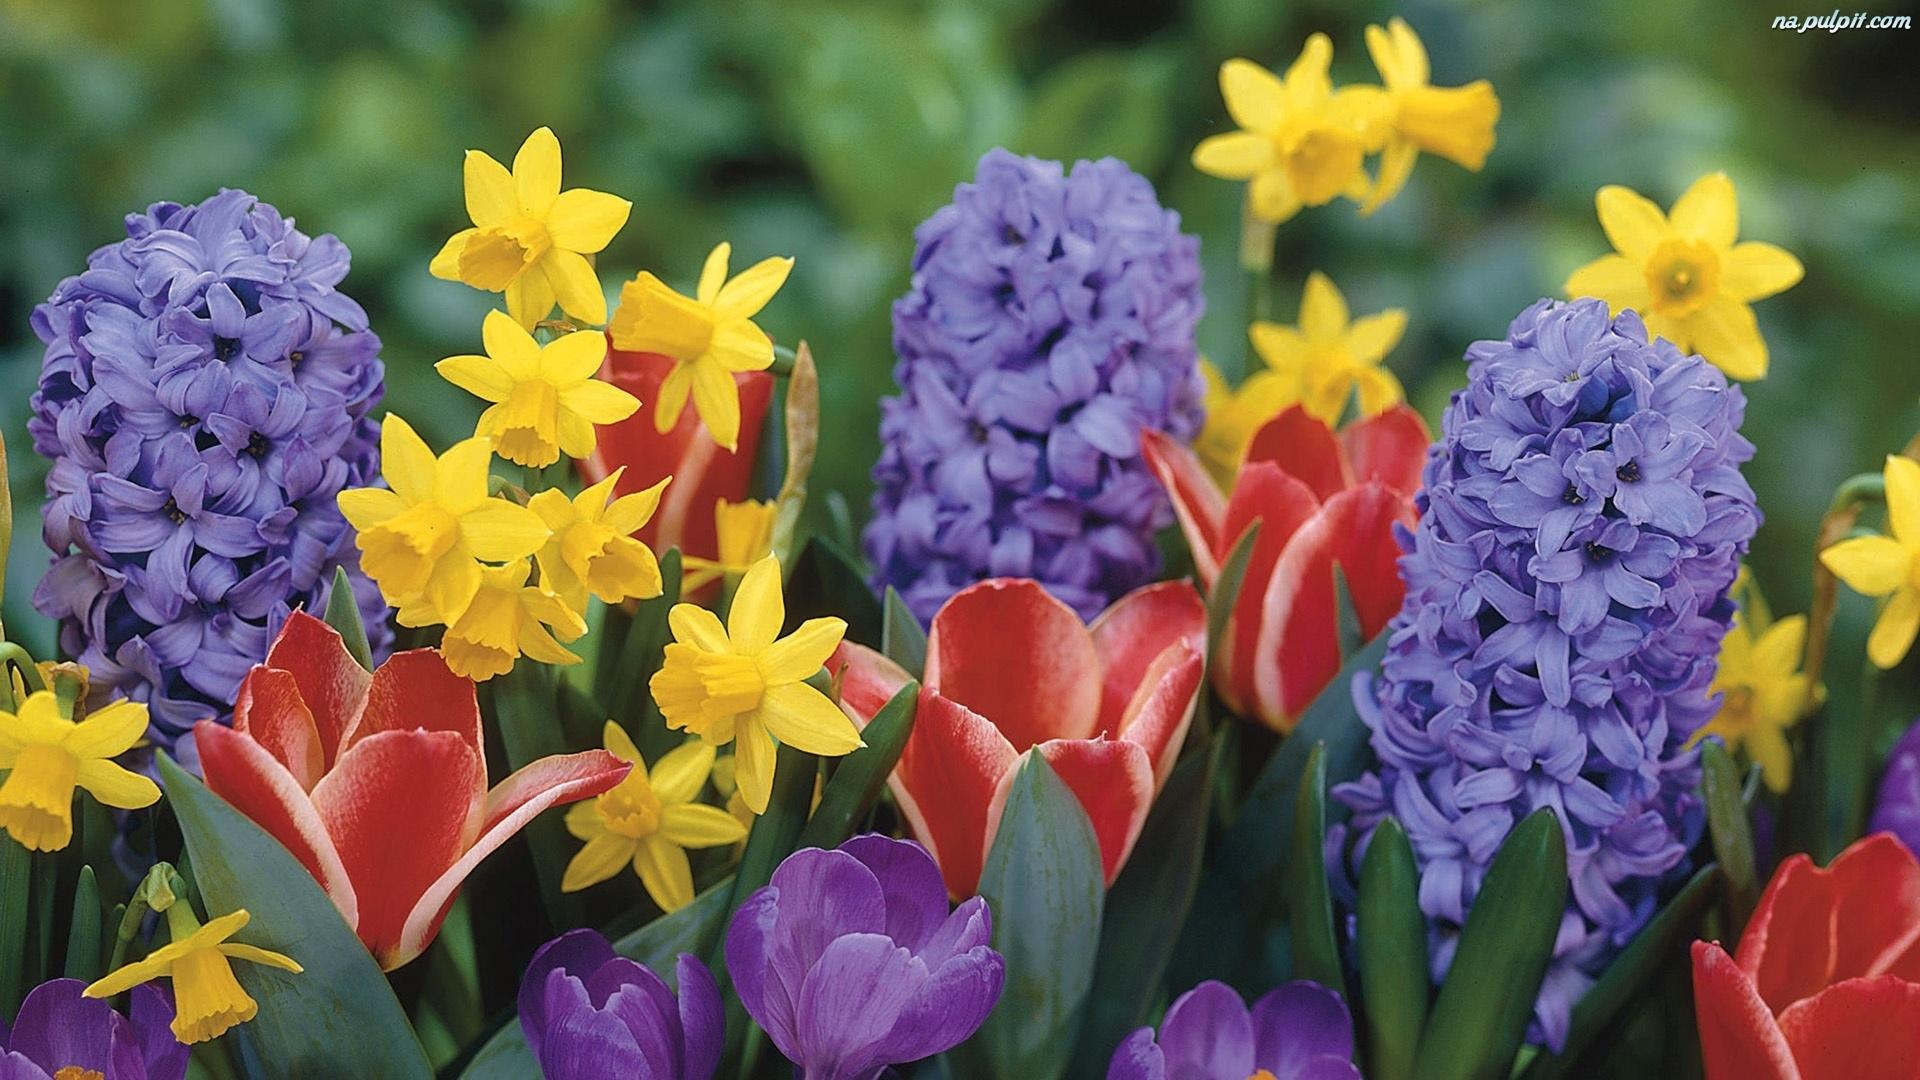 Wiosenne Kwiaty Pulpit Genuardis Portal Picture